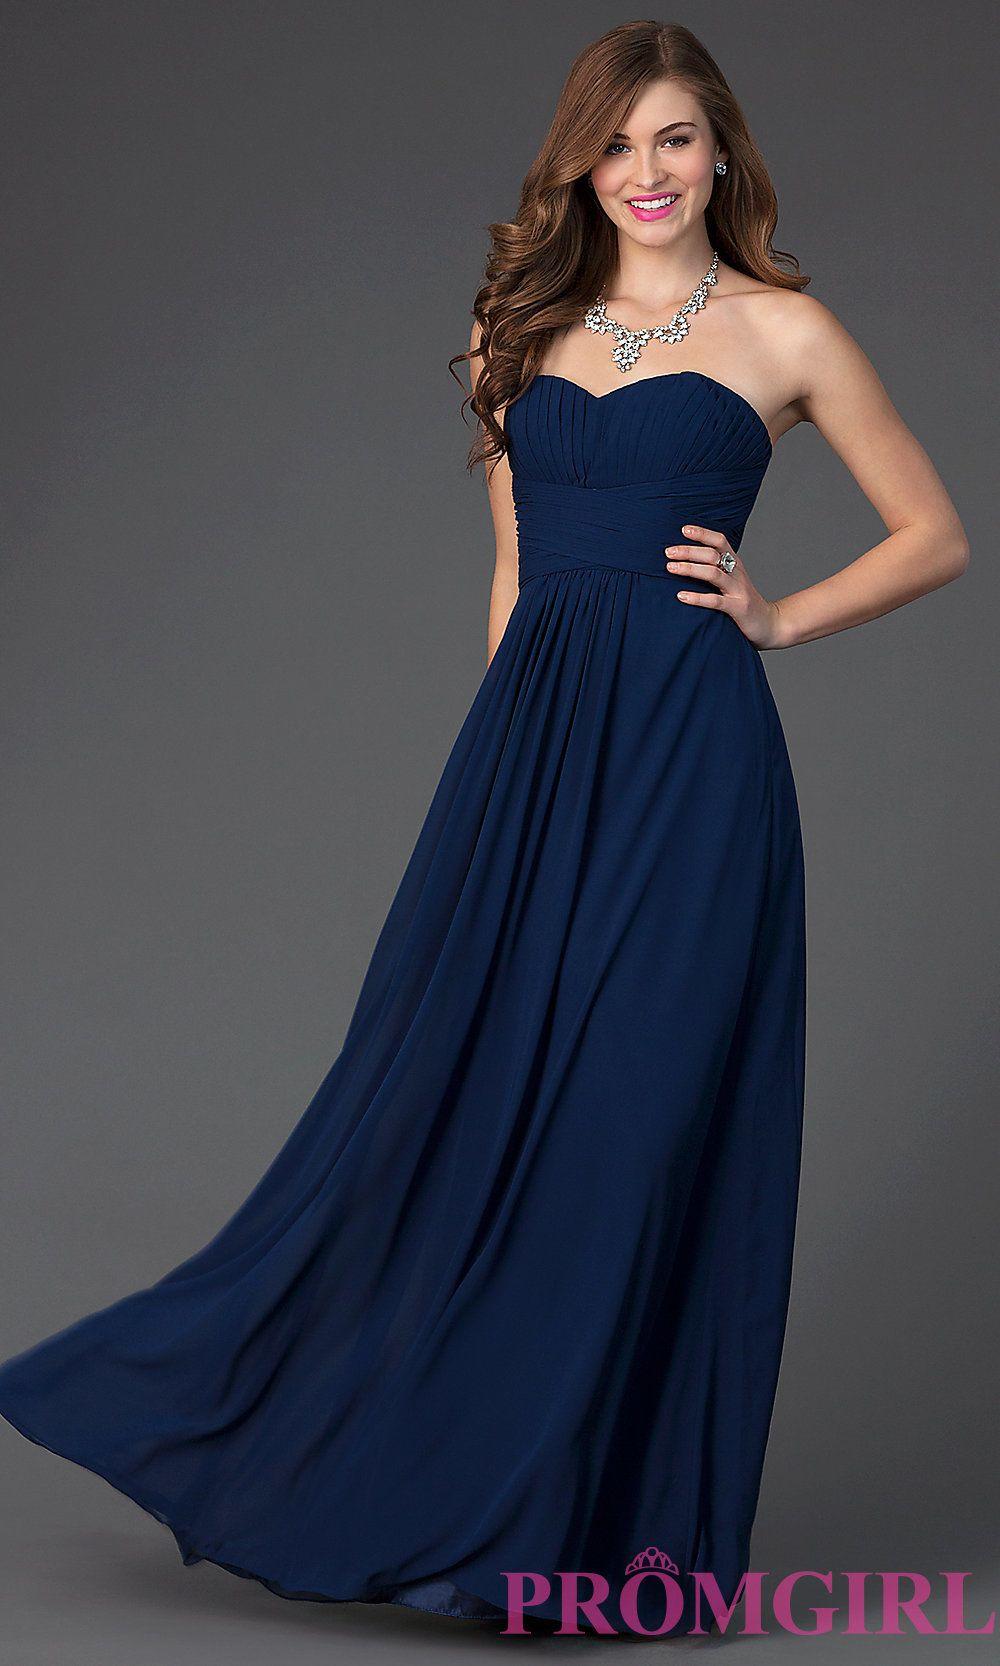 strapless sweetheart floor length chiffon prom dress bridesmaid dress party dress